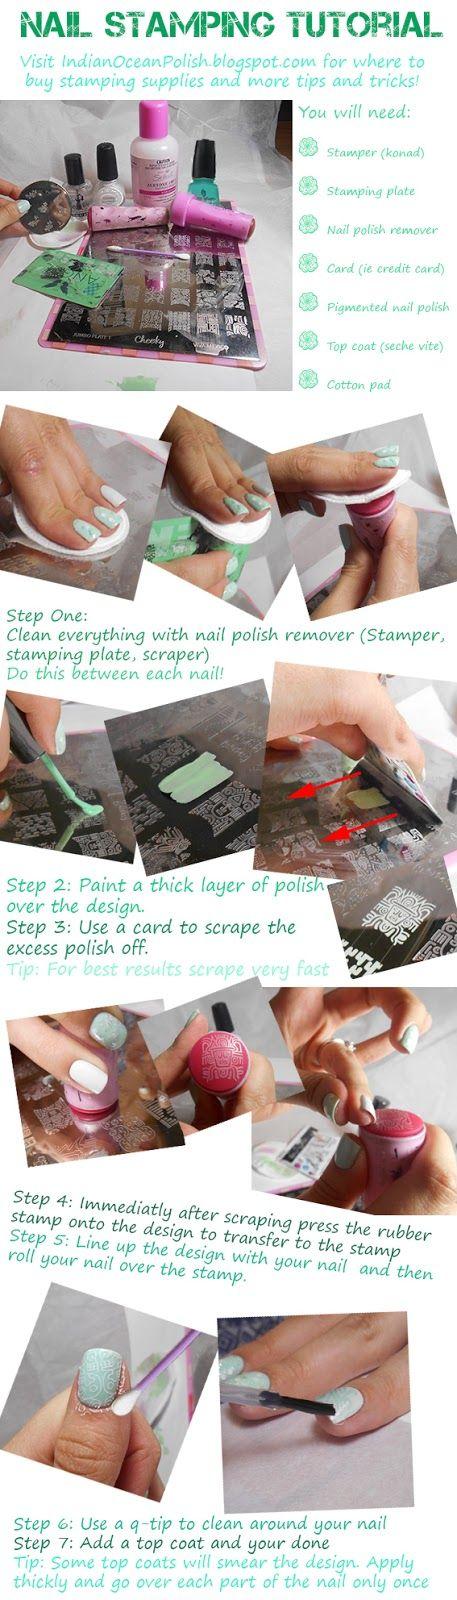 Black and White nails! Konad Nail Stamp Tutorial using nail plate ...